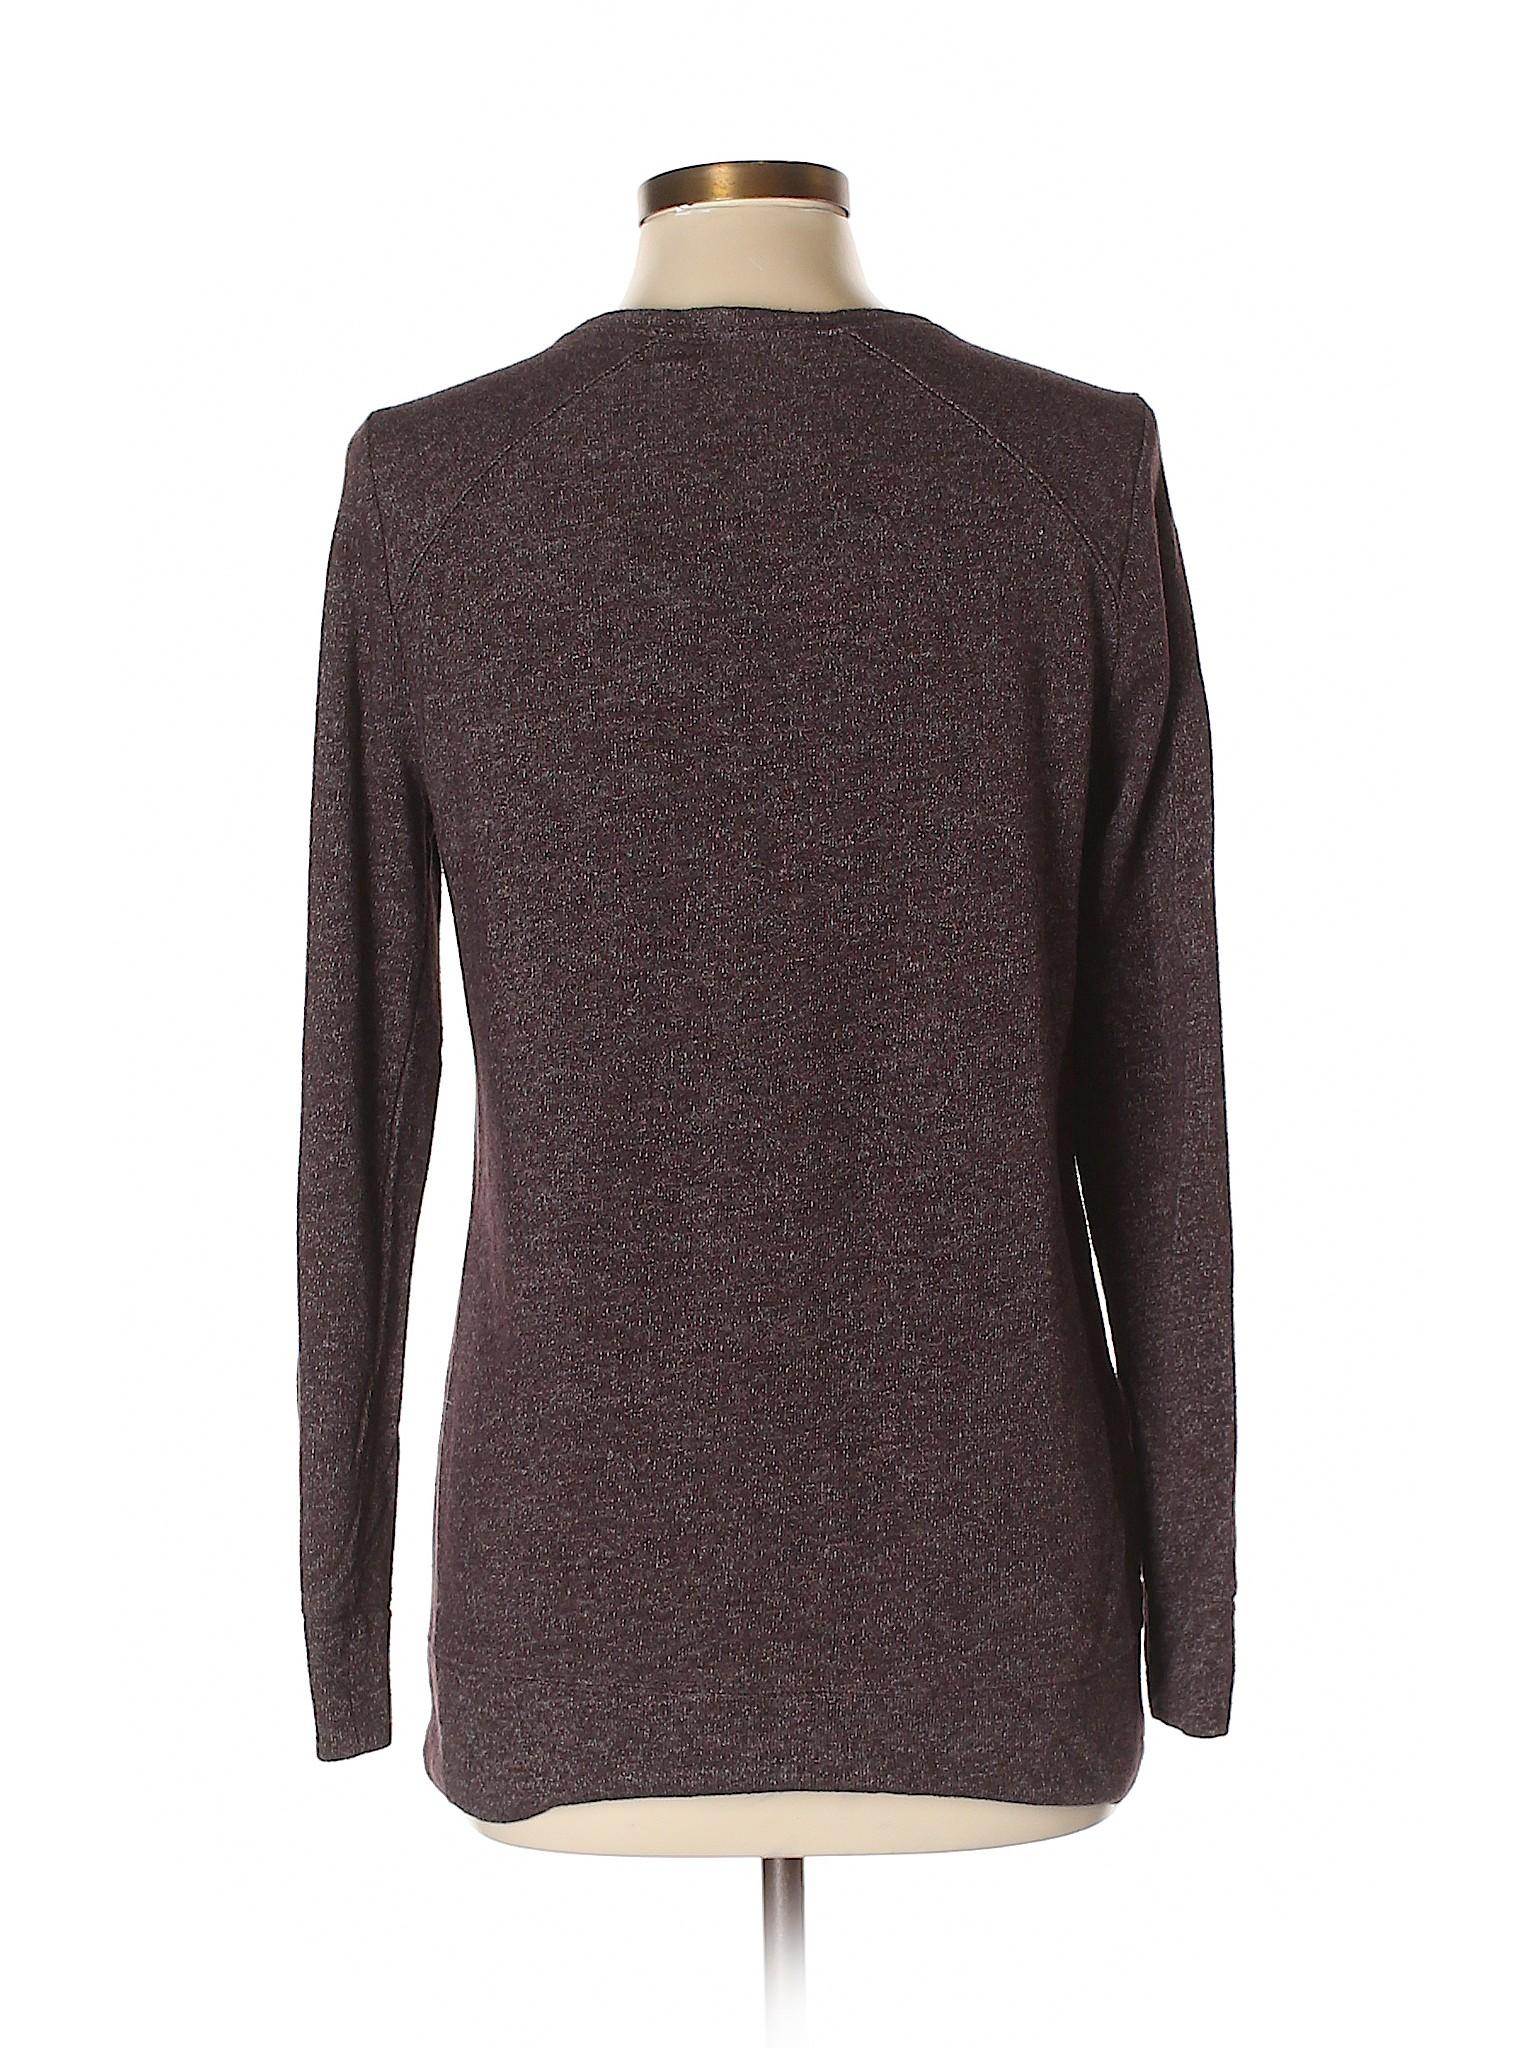 LOFT Pullover Ann Boutique Sweater Taylor waFnTq1